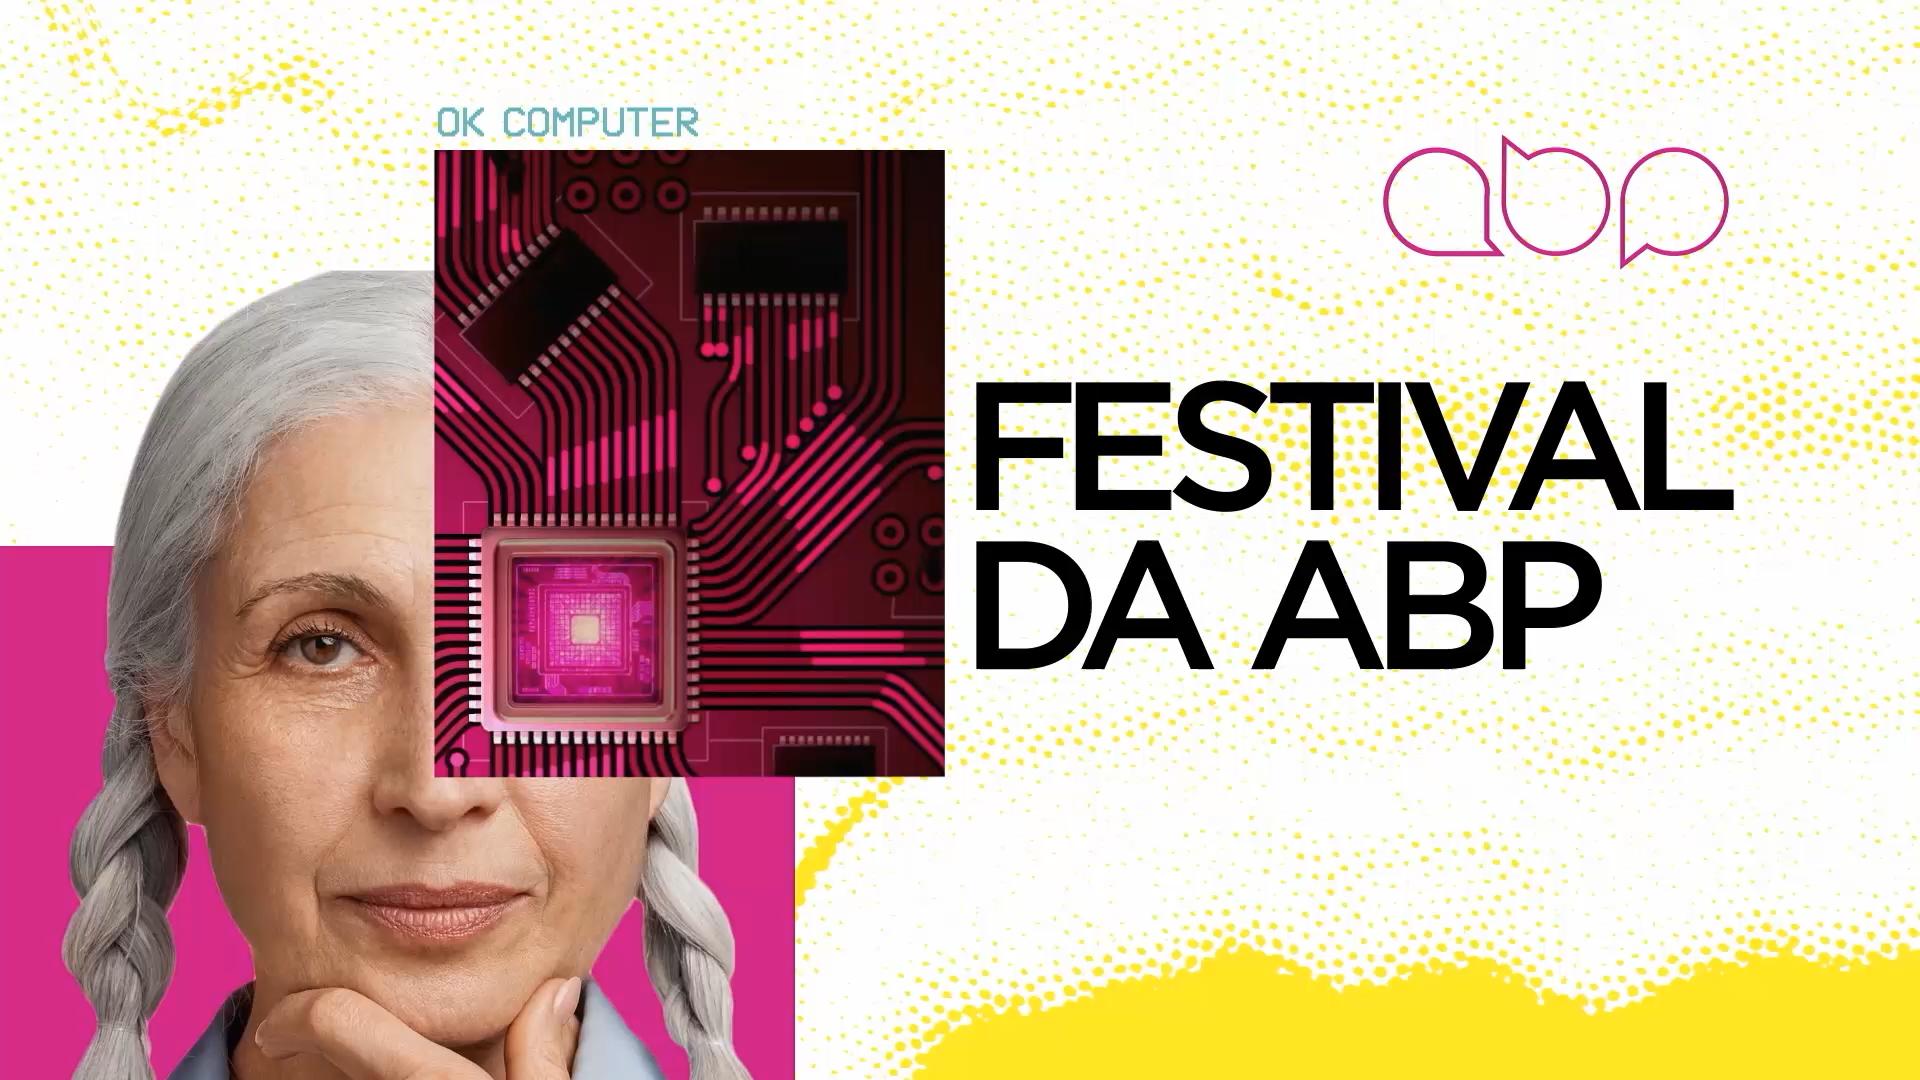 Festival ABP